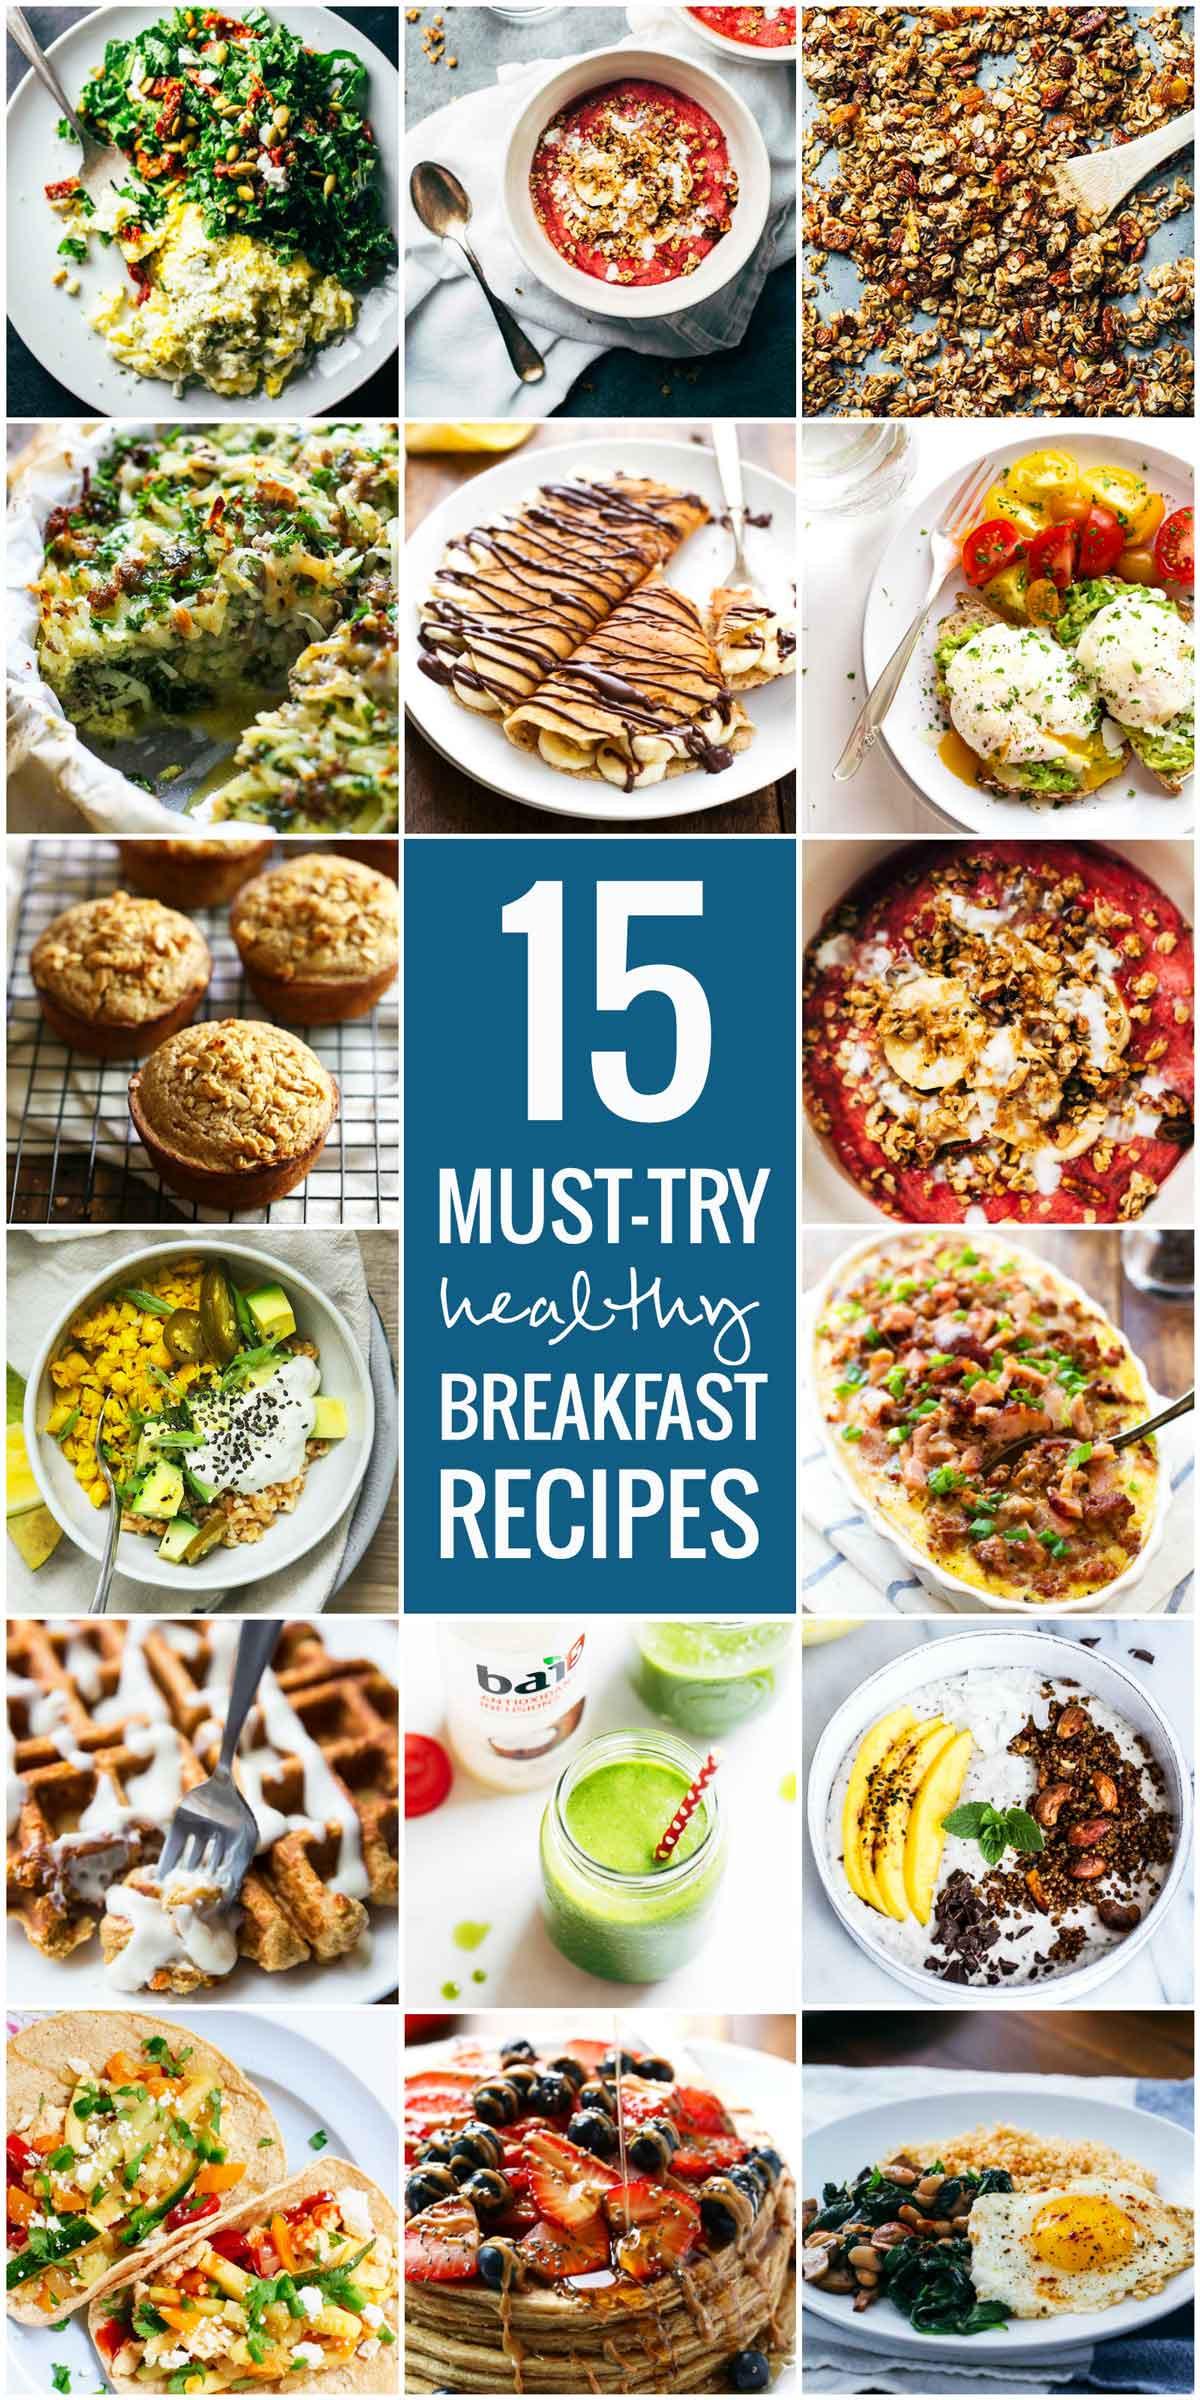 Yummy Healthy Breakfast  15 Must Try Healthy Breakfast Recipes Pinch of Yum